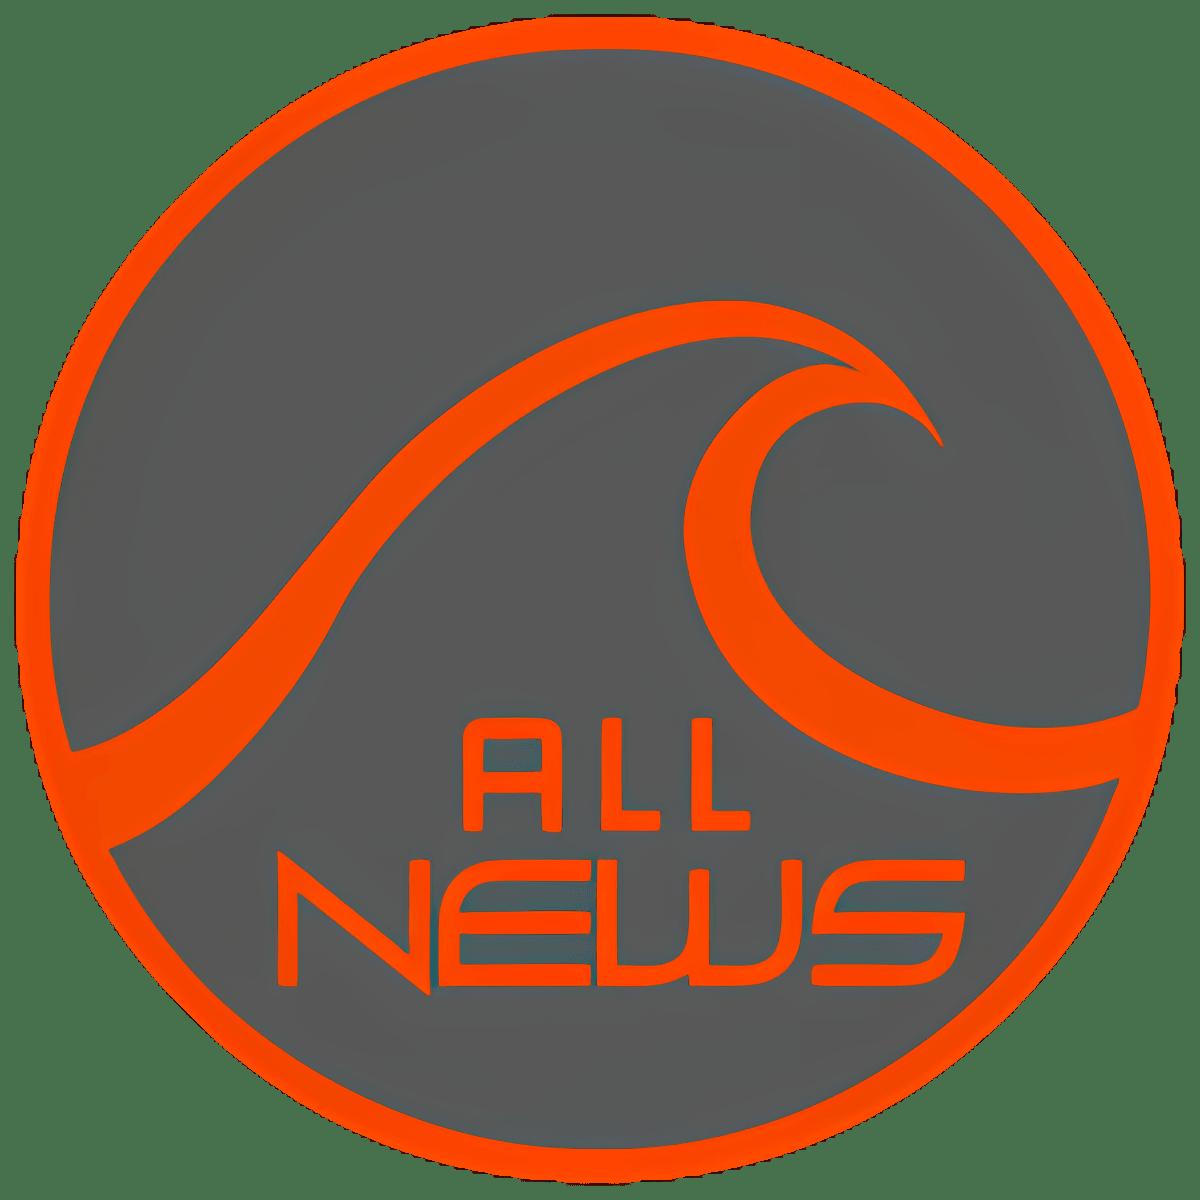 All News 1.1.1